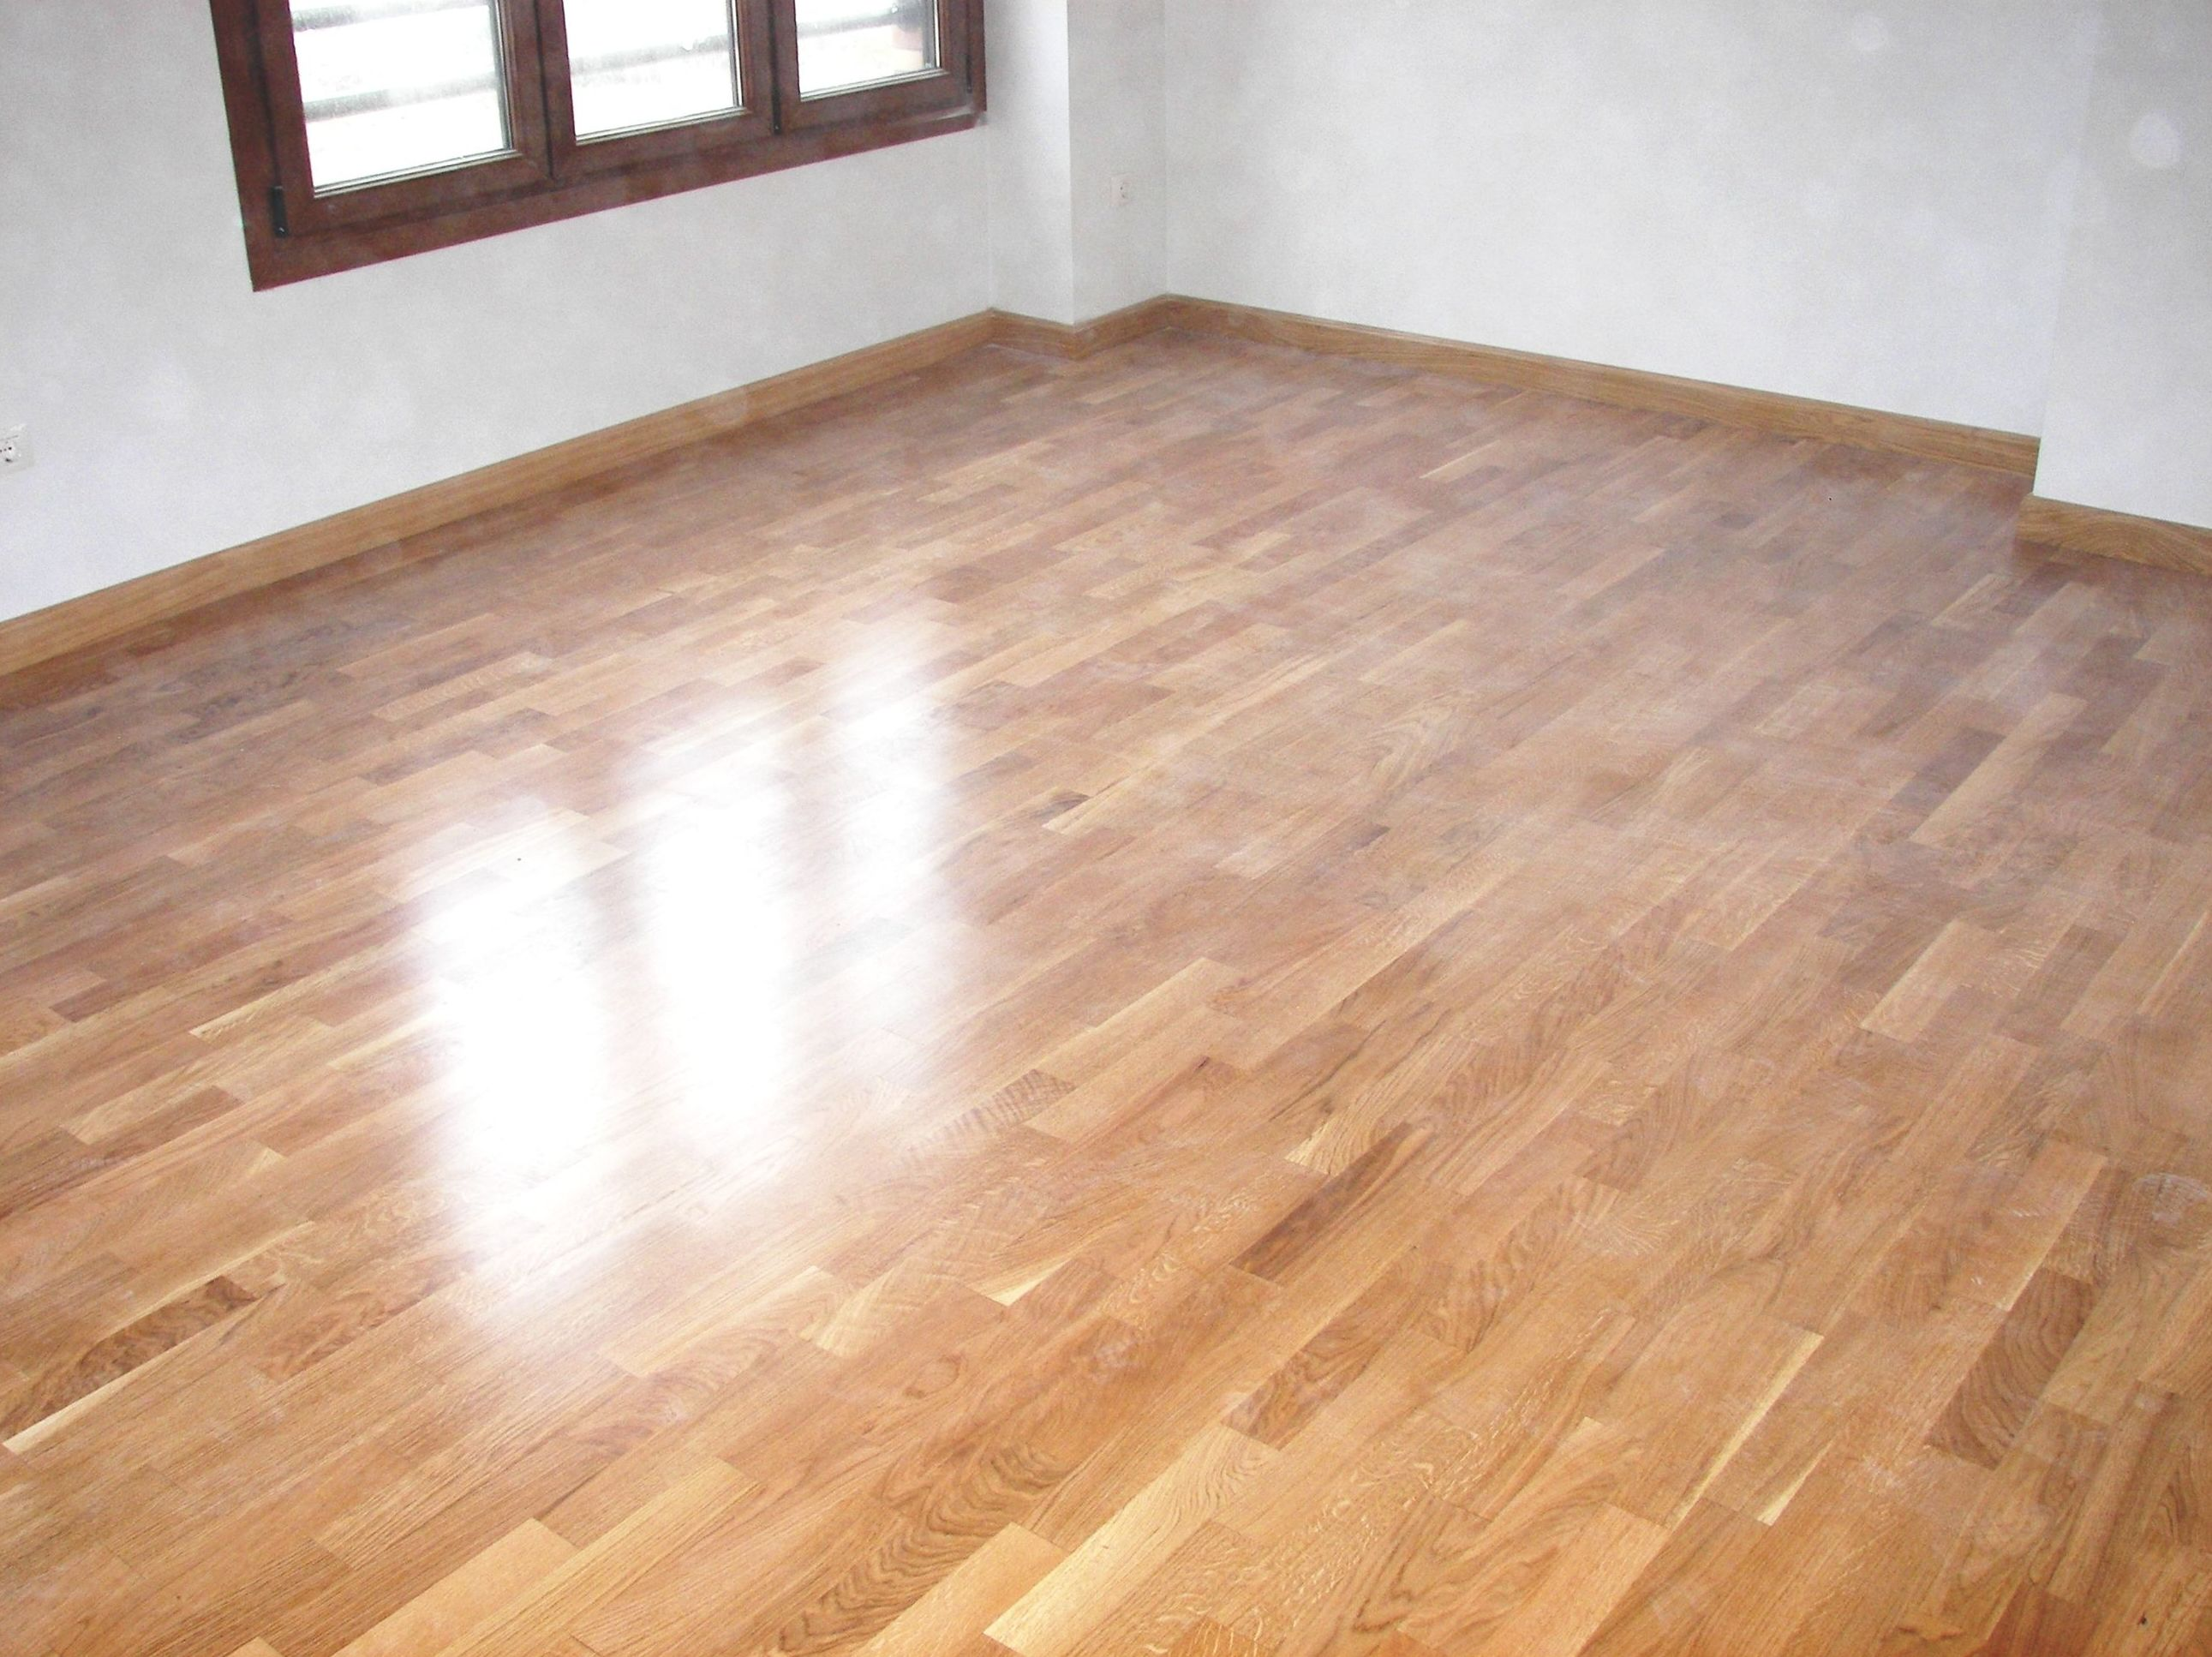 Instalacion tarima de madera y rodapie  ASTURIAS, ESPAÑA